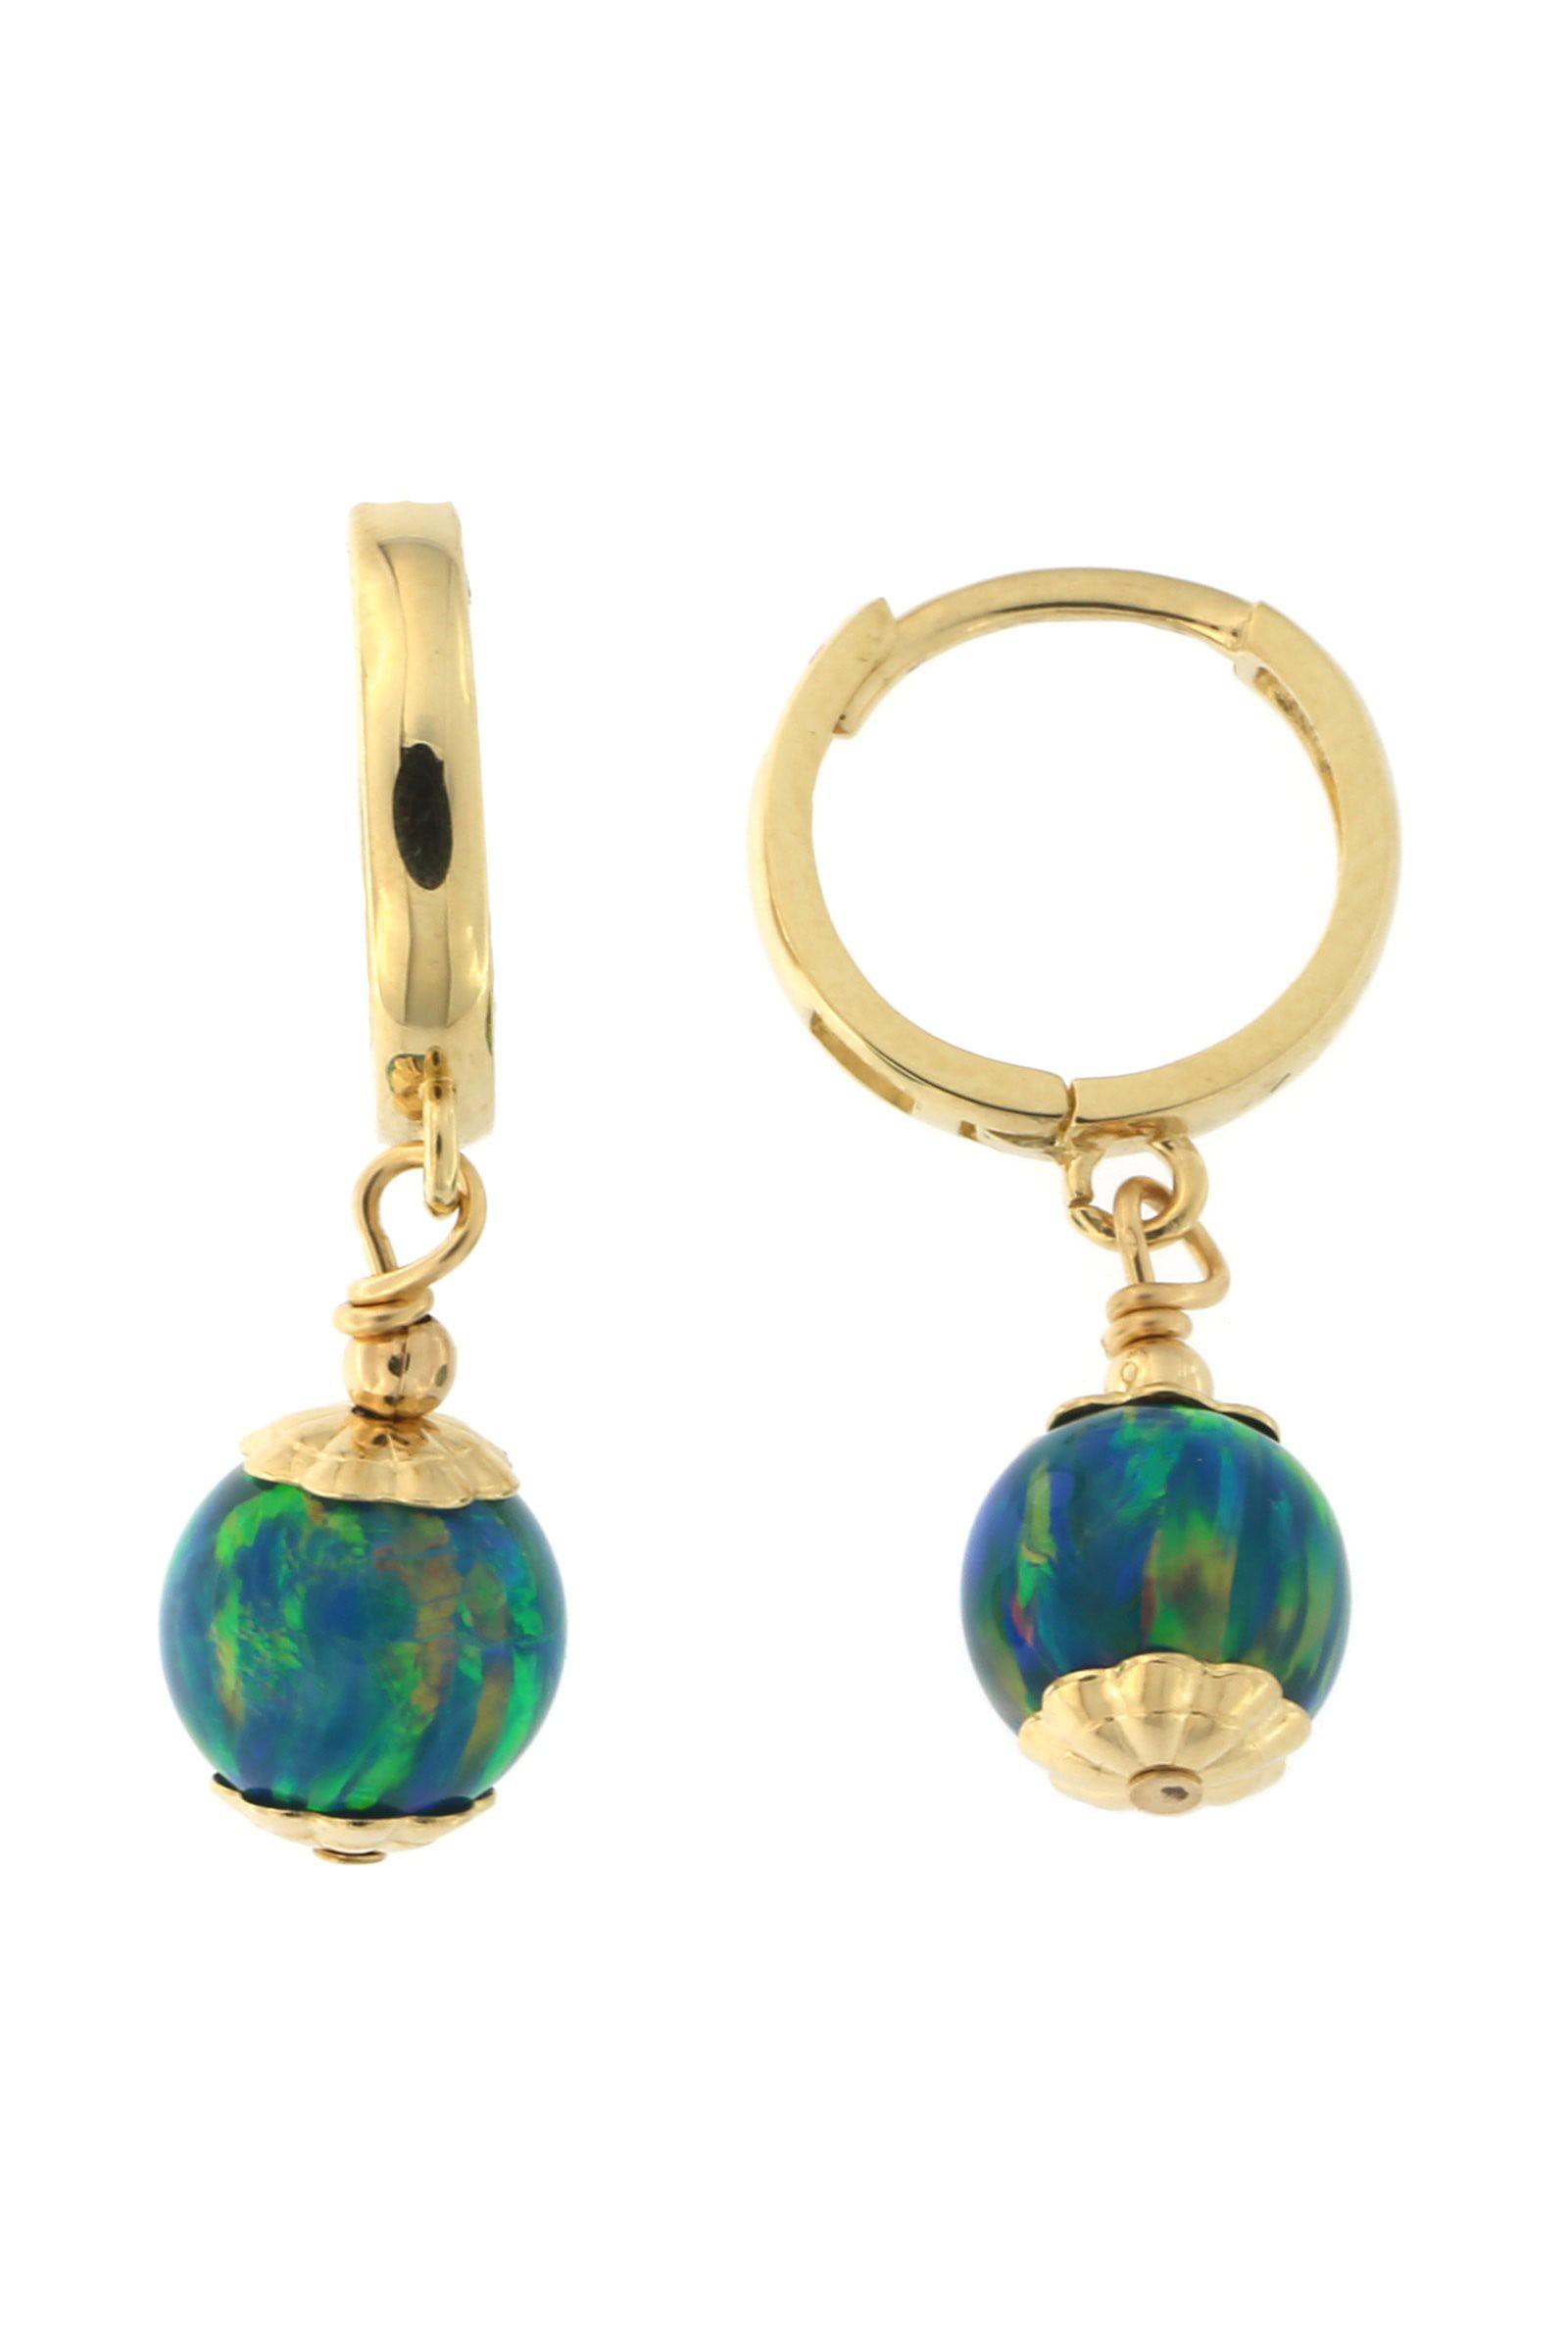 14k Yellow Gold 7mm Simulated Opal Huggie Dangle Earrings by